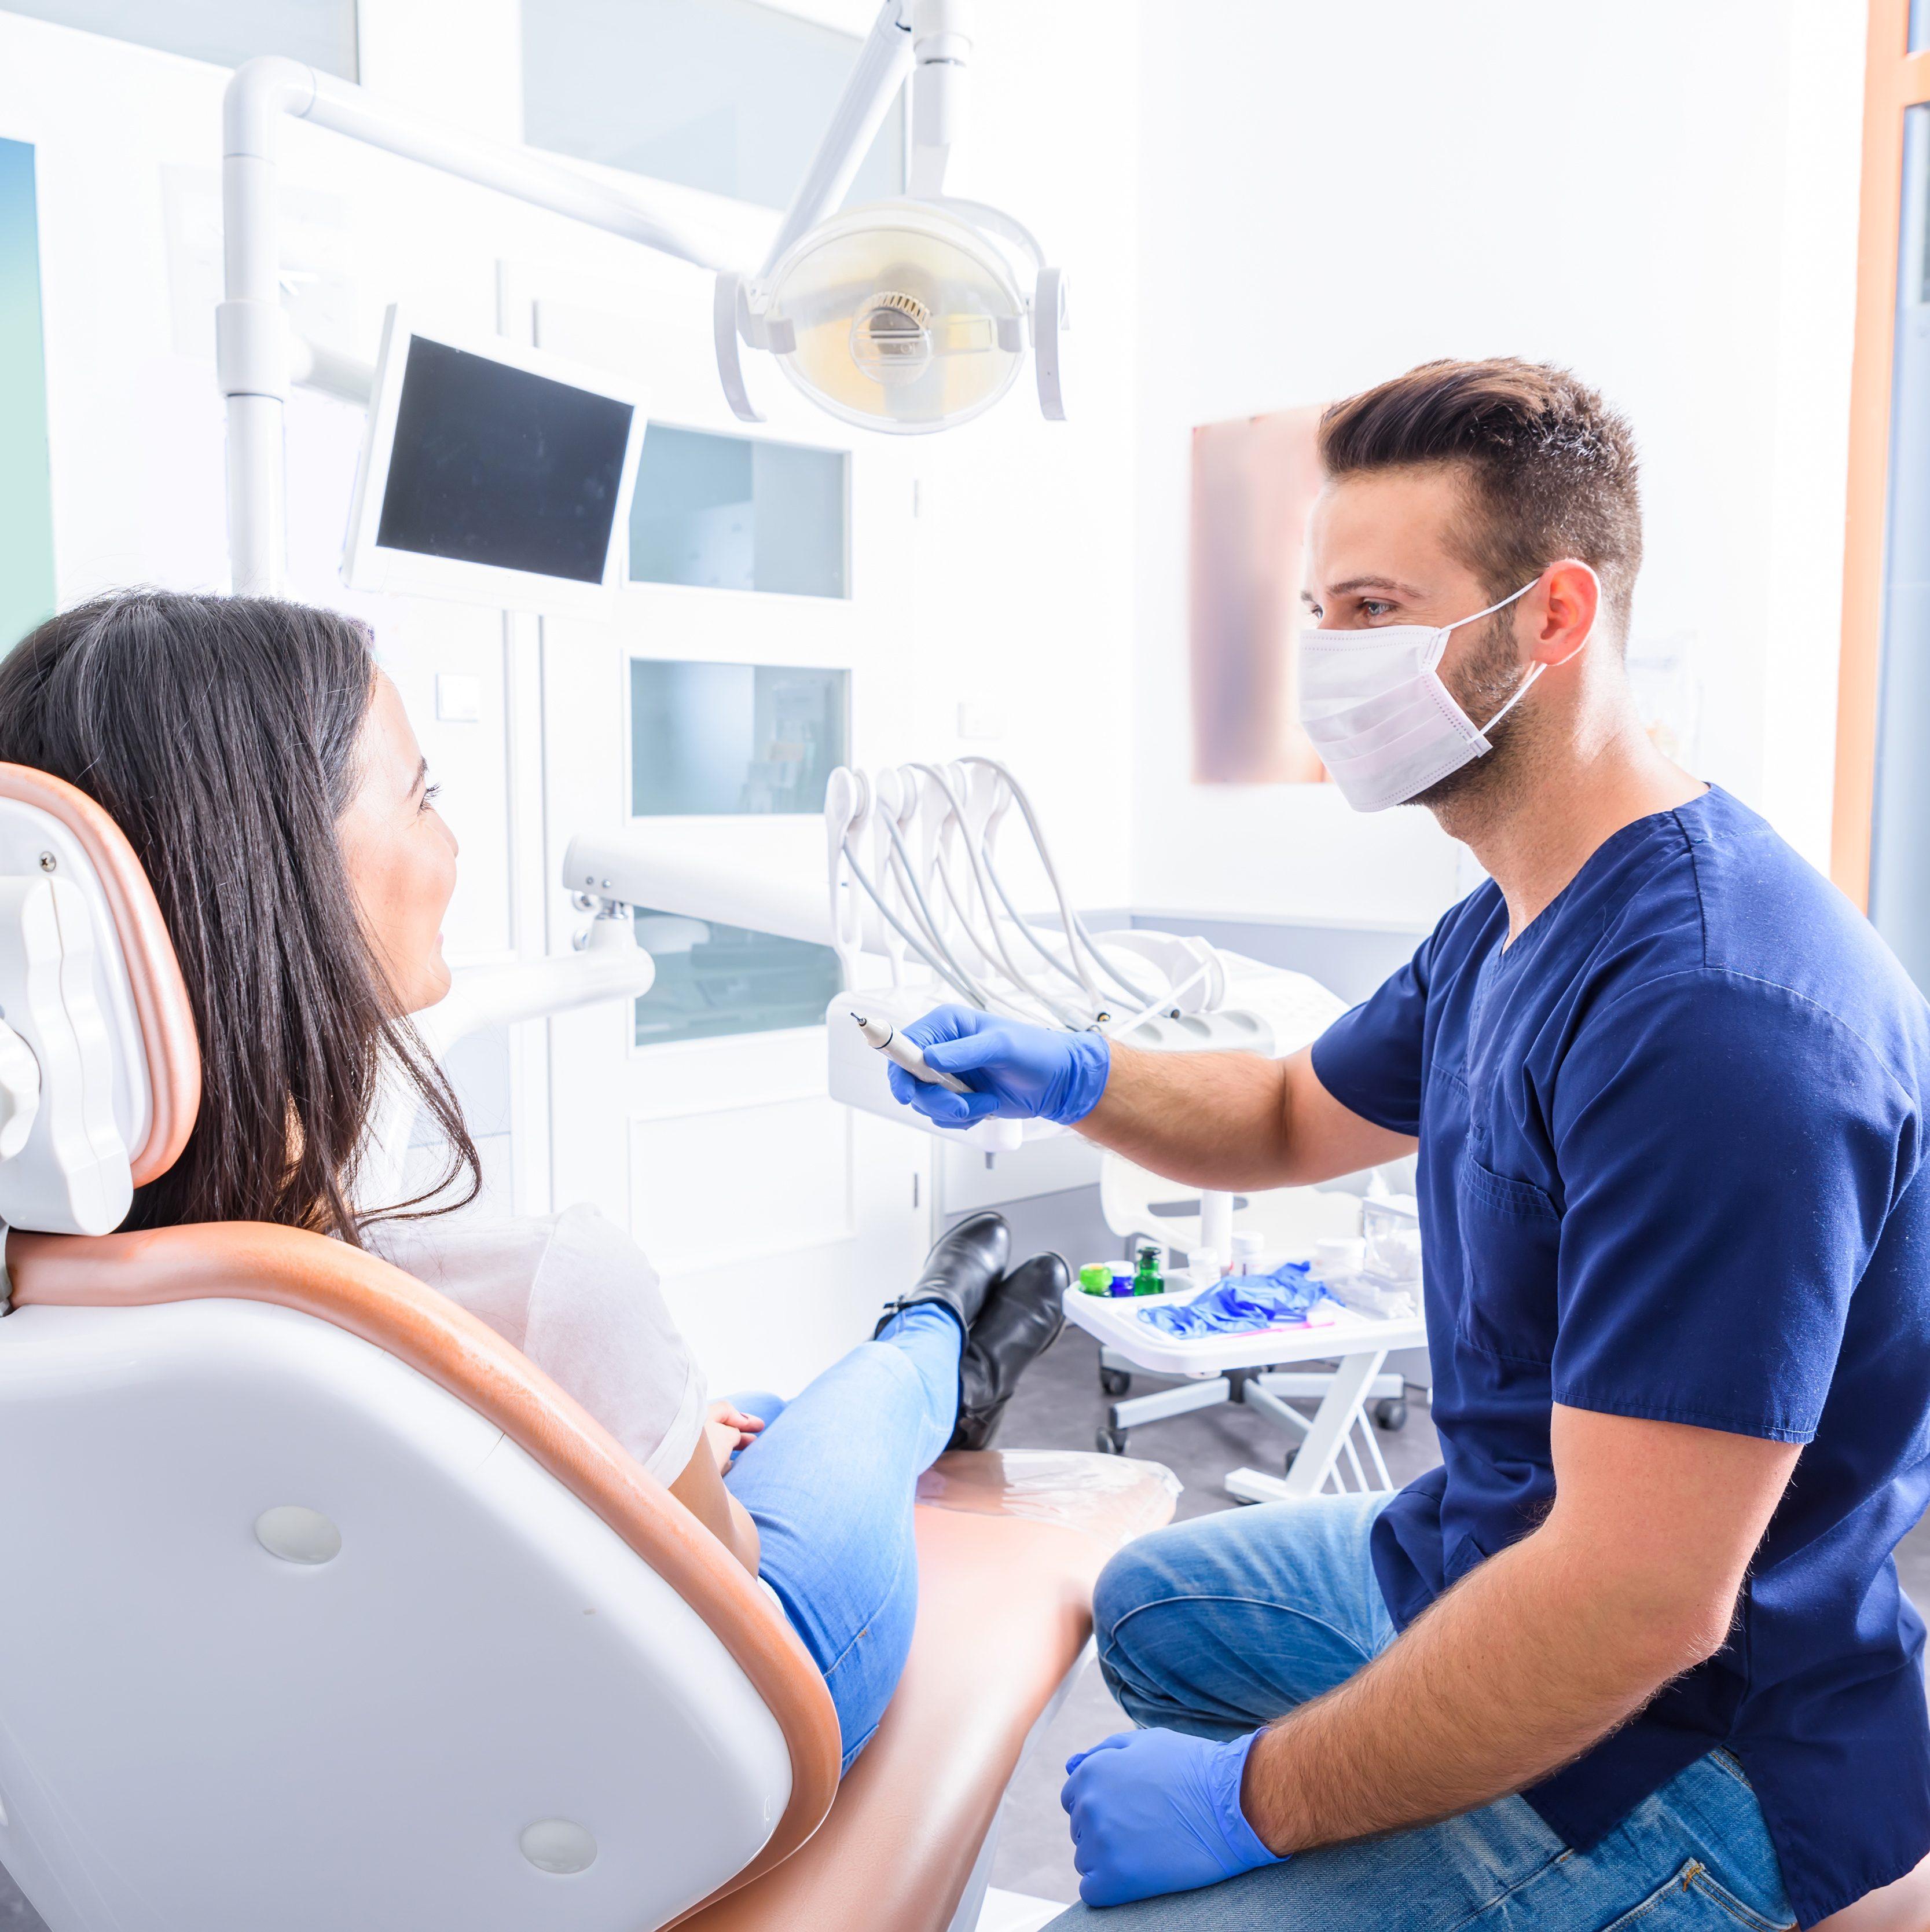 Ernst Auto provides dental care coverage